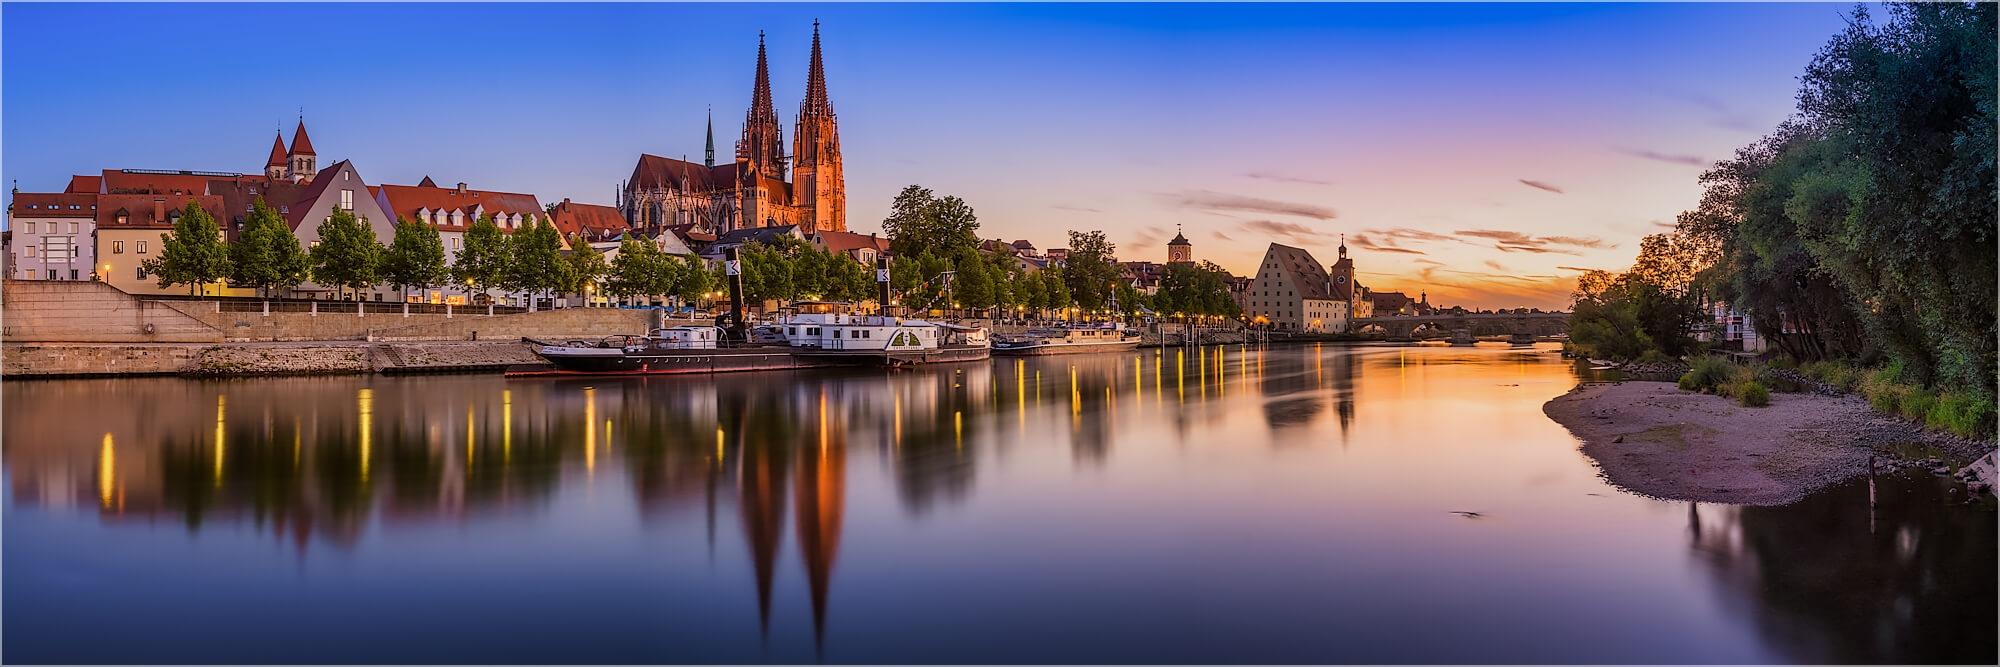 Panoramabild Regensburg im Sonnenuntergang